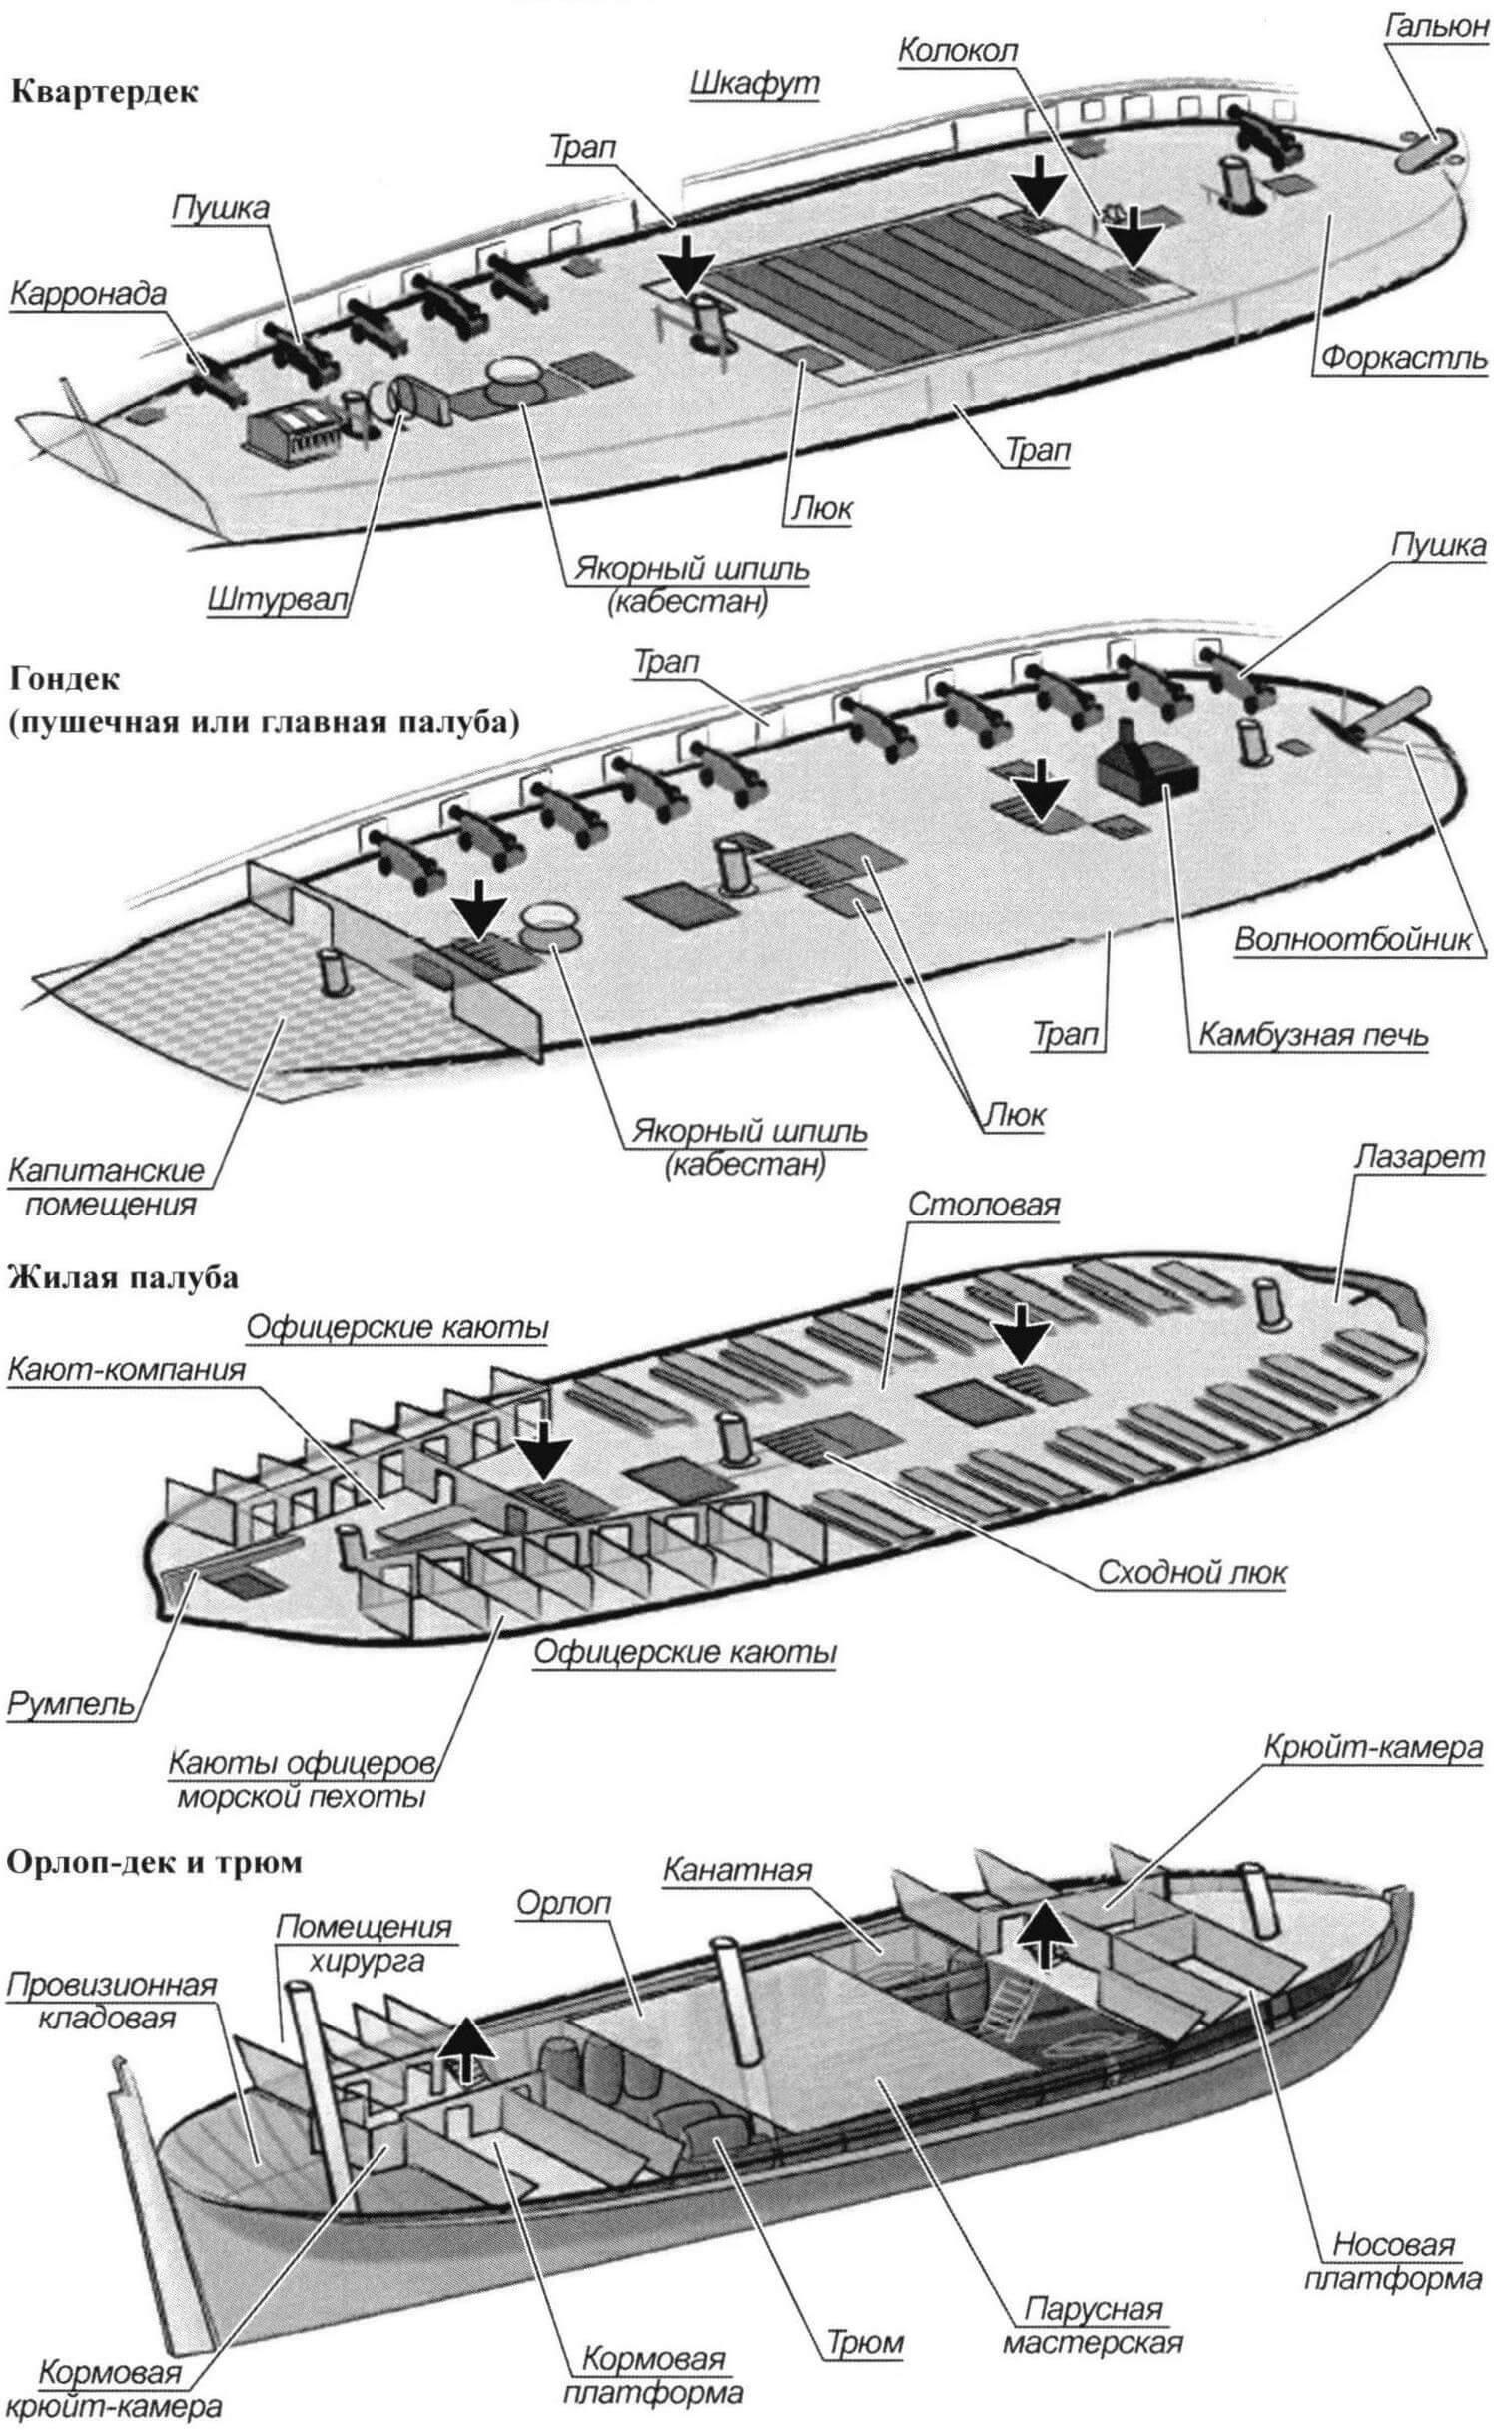 Палубы и трюм фрегата «Тринкомали»